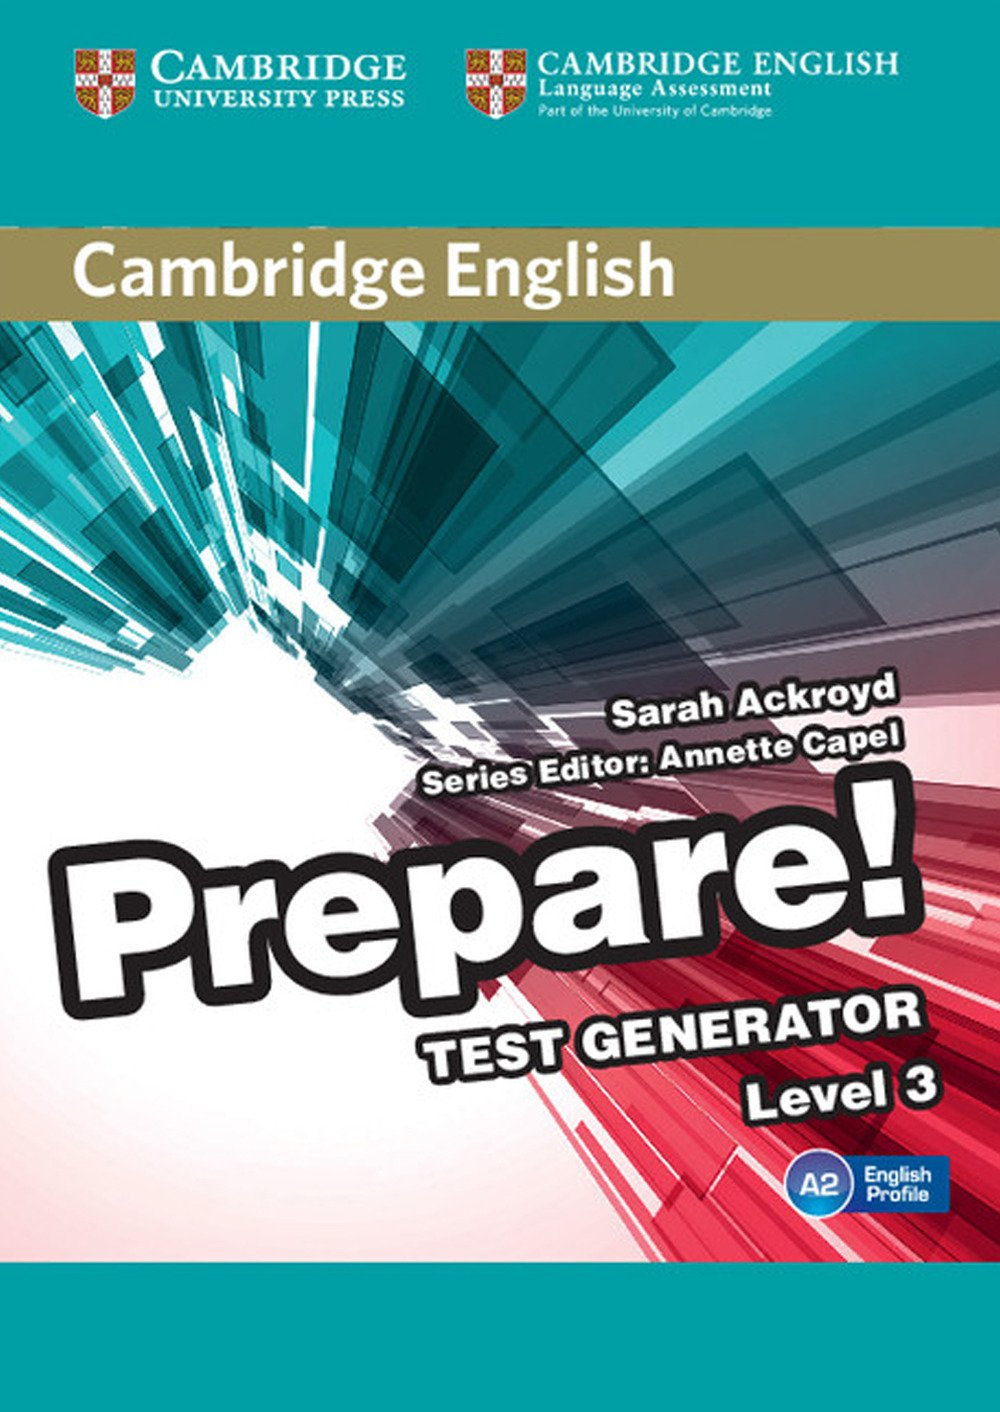 Cambridge English Prepare! Test Generator Level 3 CD-ROM ebook